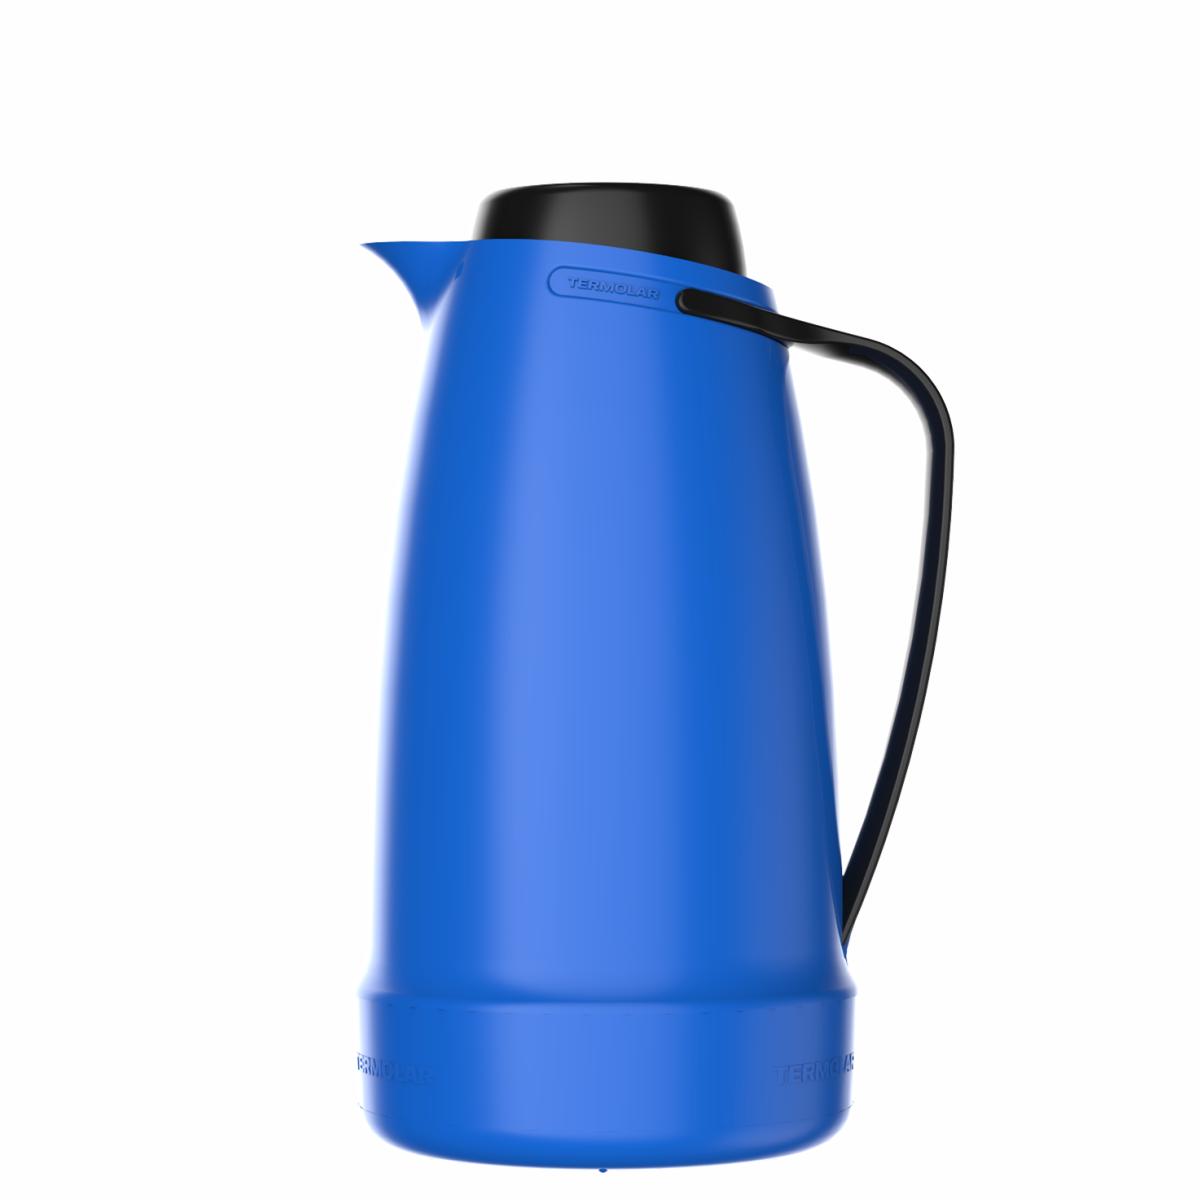 bule dama azul 500ml 3802eaz azul garrafas térmicas termolar